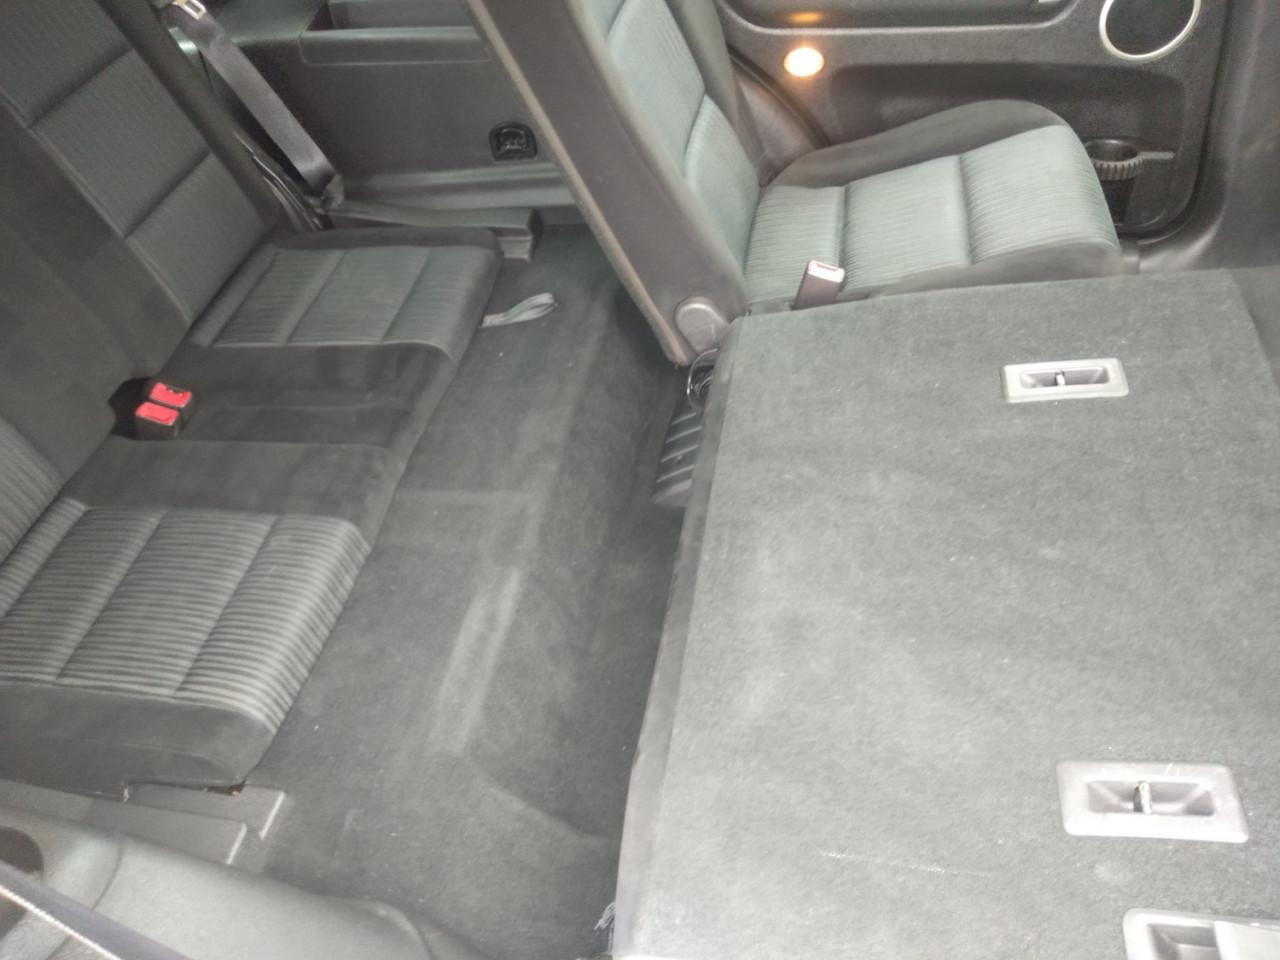 2013 Ford Territory SZ TS Wagon Image 12